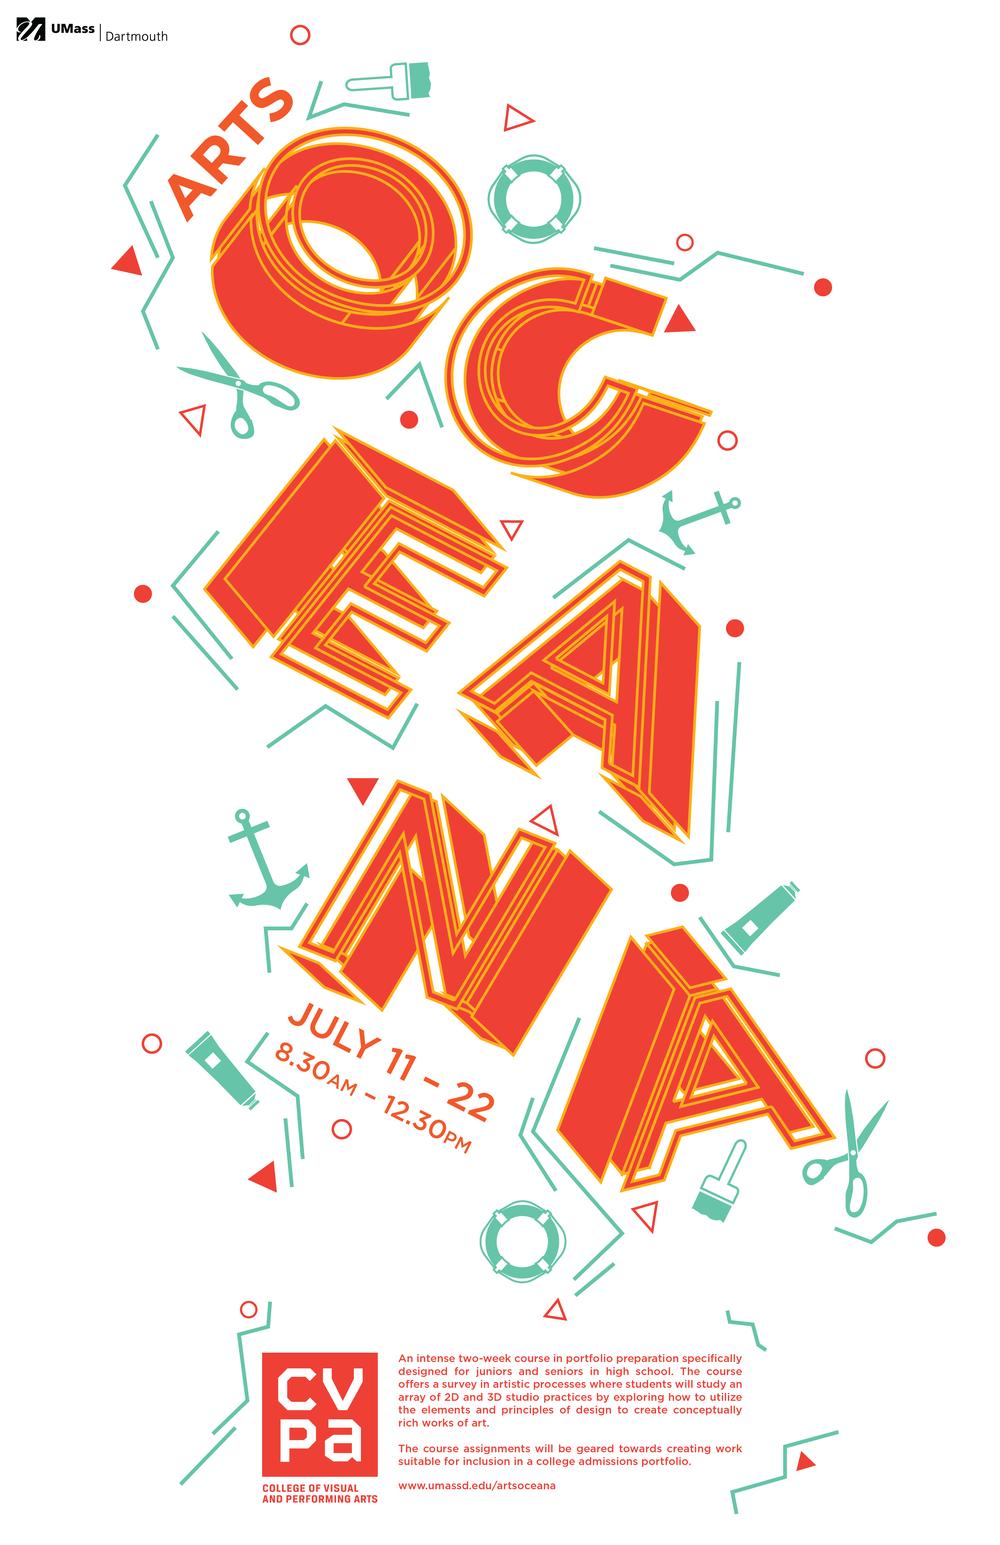 CLIENT POSTER   Promotional poster designed for the Arts Oceana summer art program